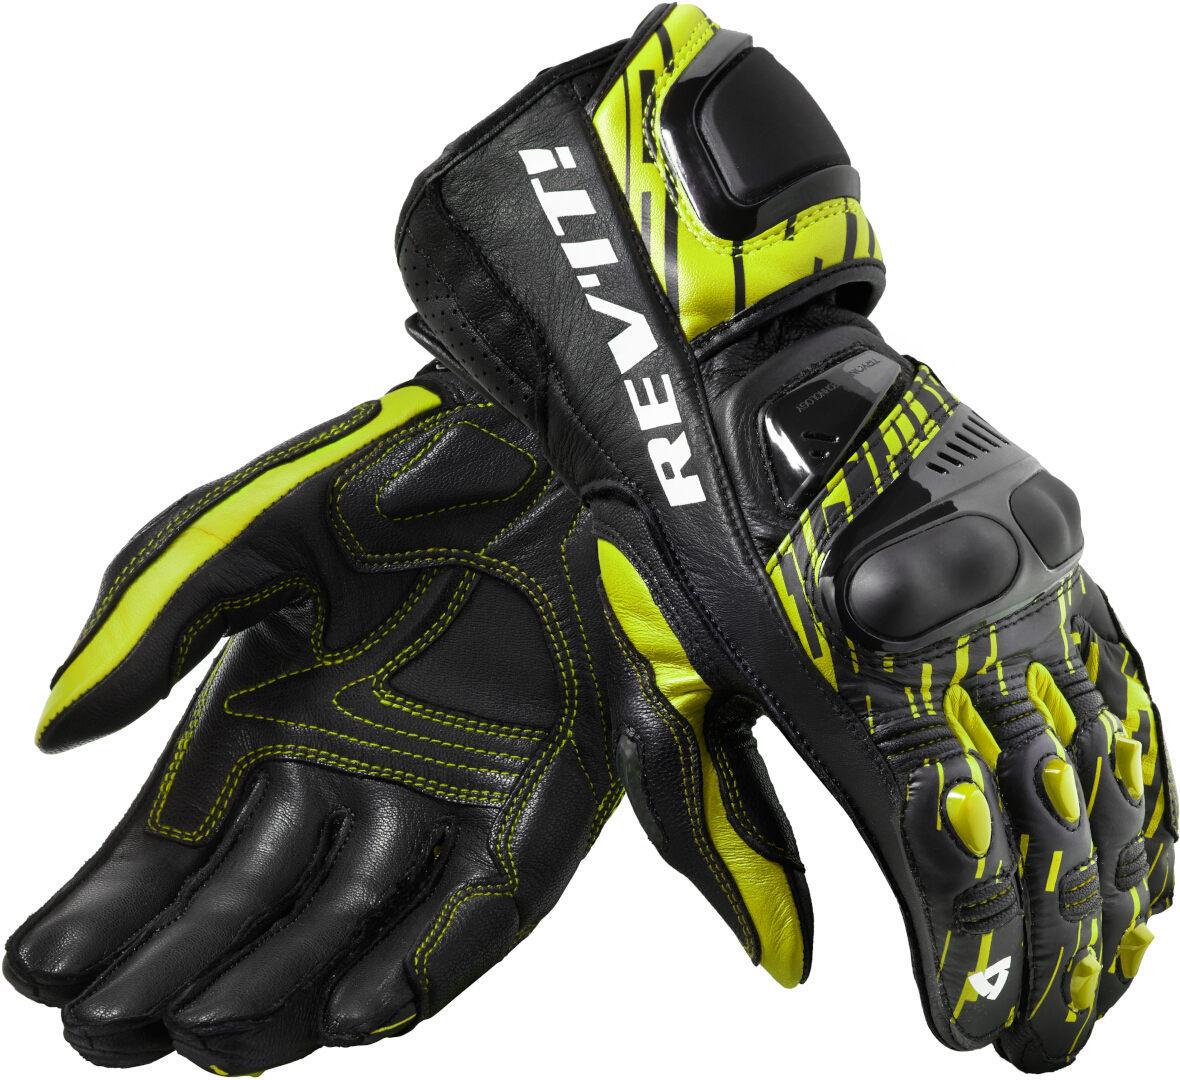 Revit Quantum 2 Motorradhandschuhe, schwarz-gelb, Größe M, schwarz-gelb, Größe M